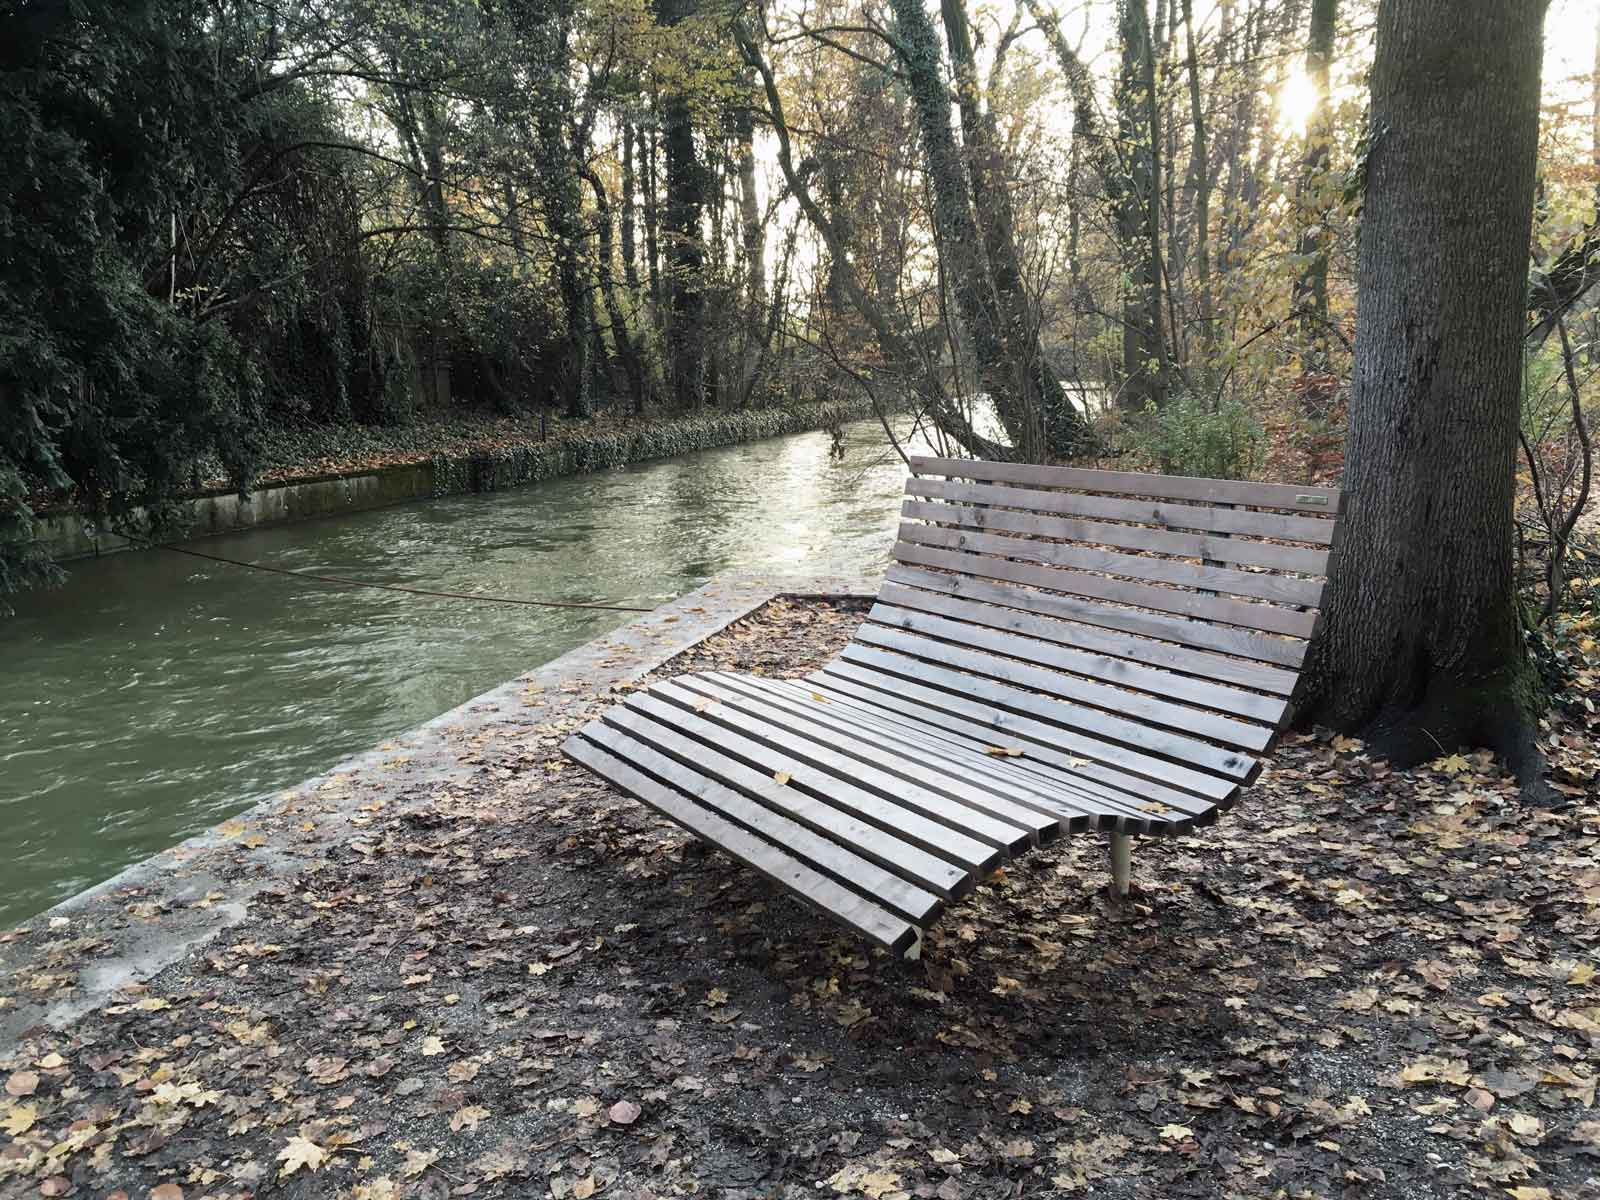 Sitzbank-gewellt